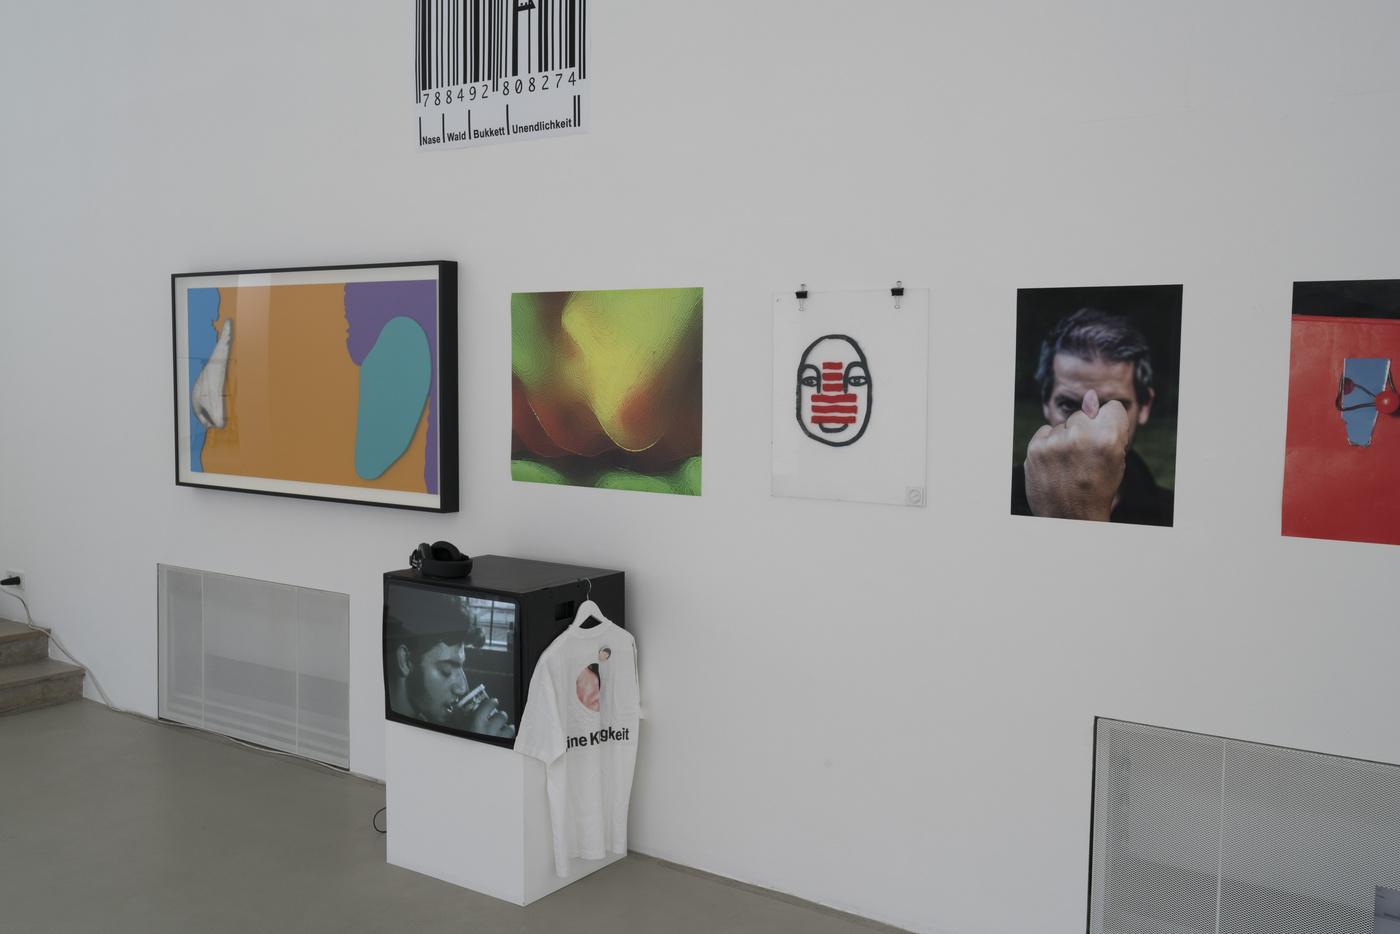 Darius Mikšys, Hayward & Tamayo, Exhibition View in Kunstverein München 2016 © Kunstverein München e.V.6